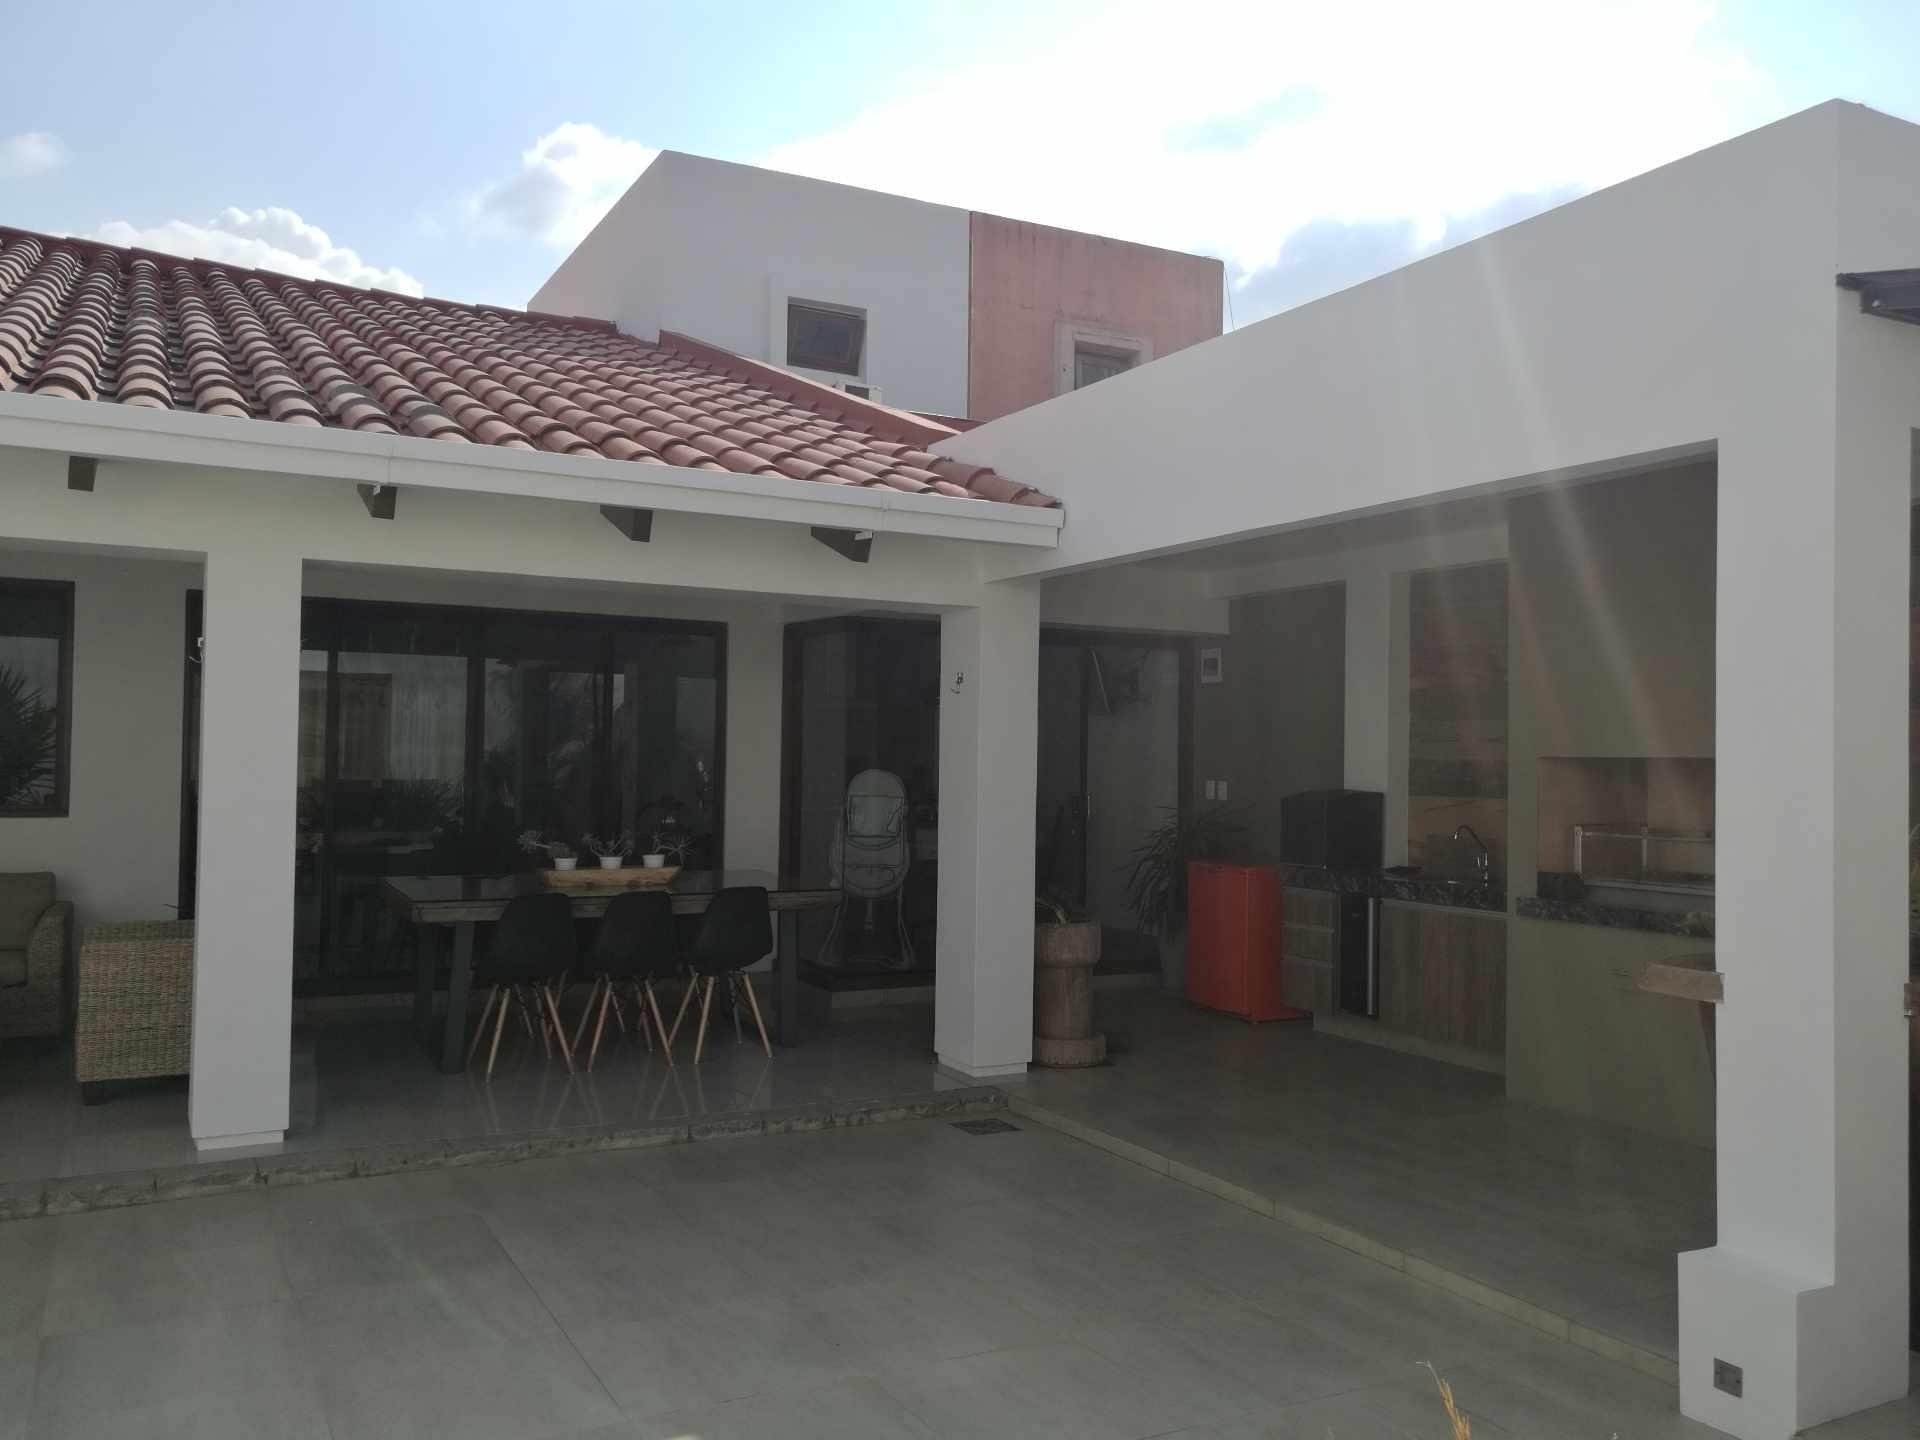 Casa en Venta Condominio La Hacienda I 5to anillo entre Av Cristo Redentor y Av. Beni Foto 2